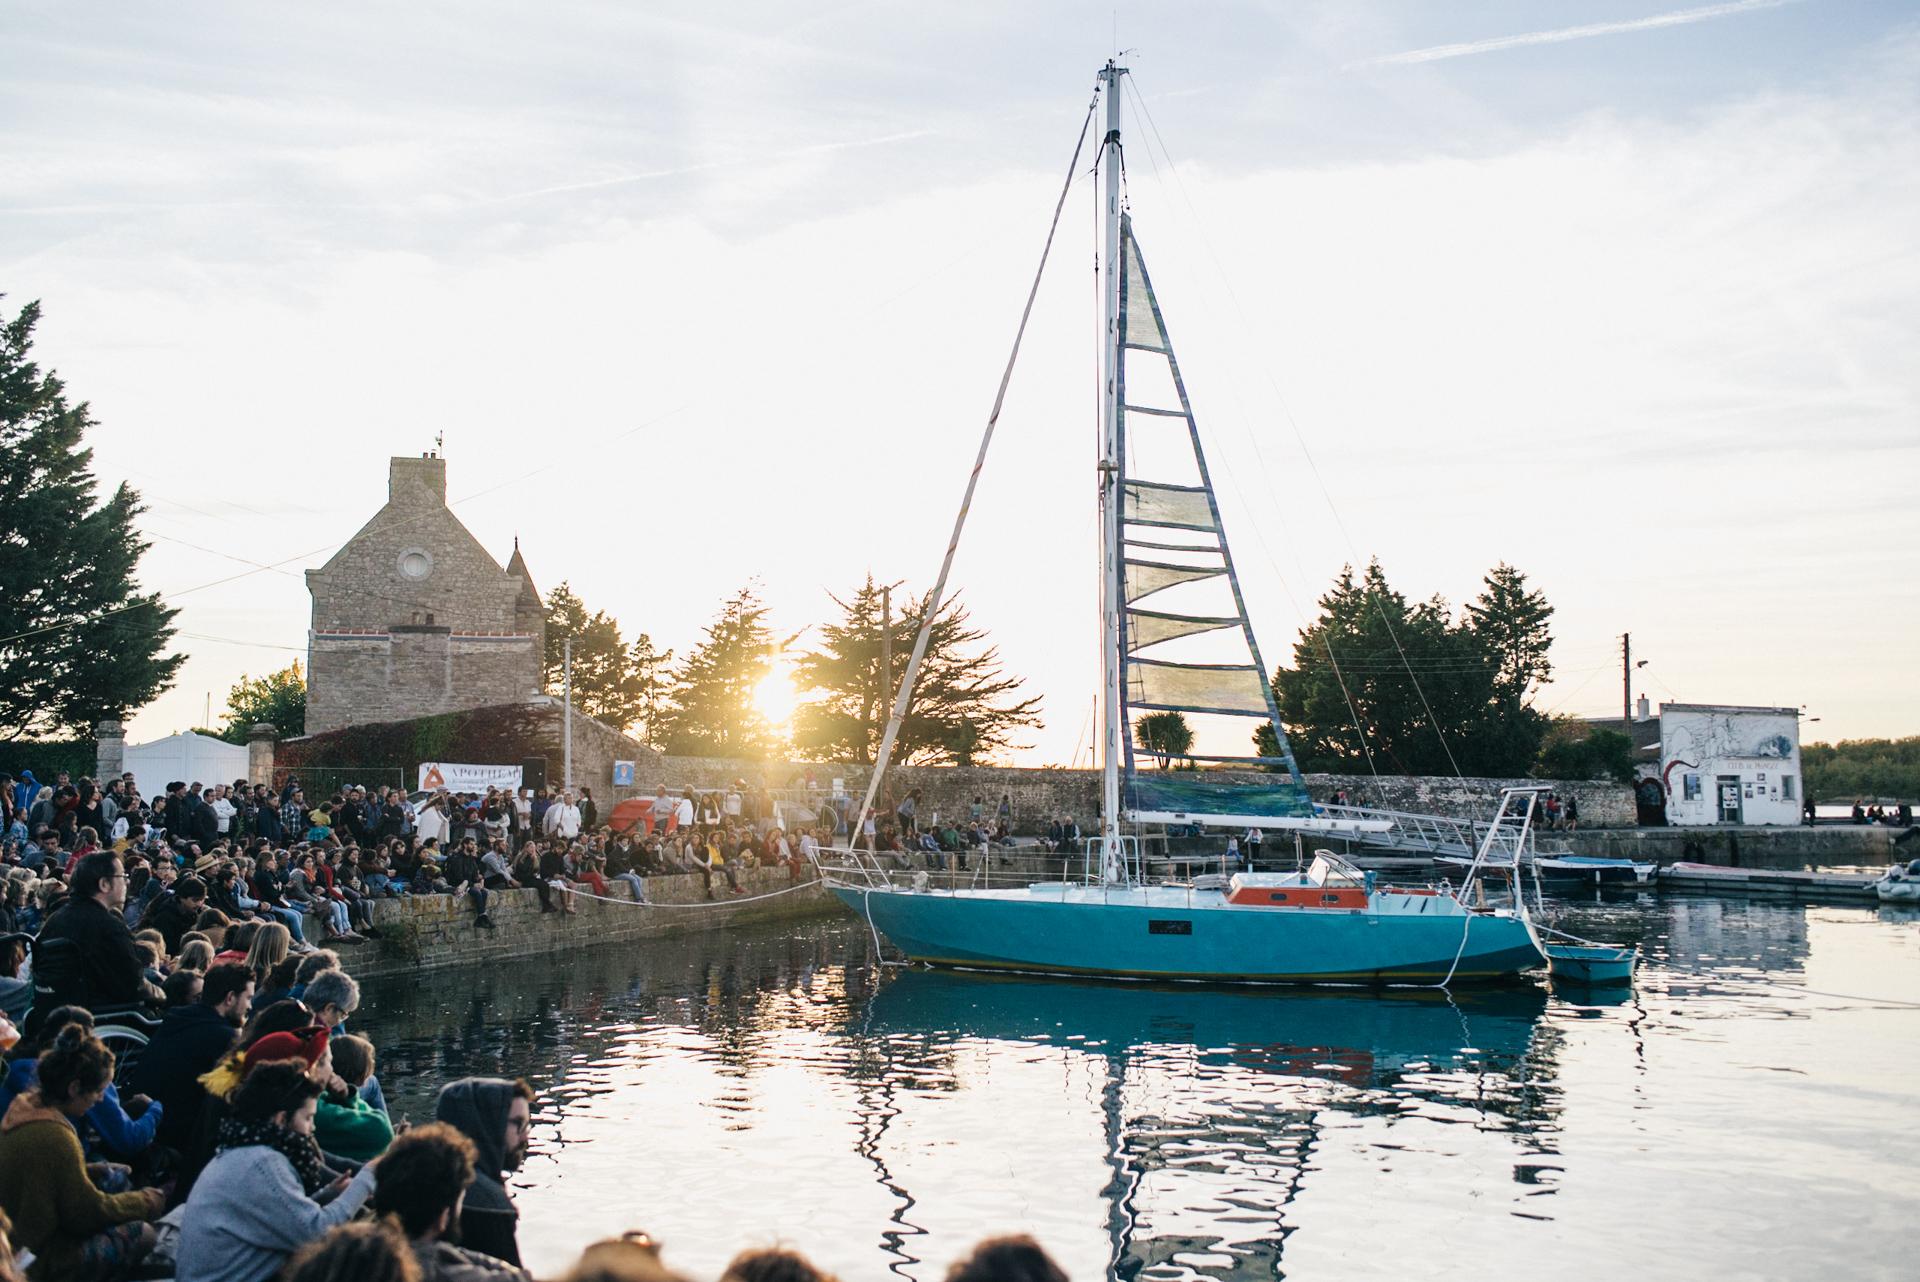 2018-09-29_festival_loc_festinalente_0654.JPG